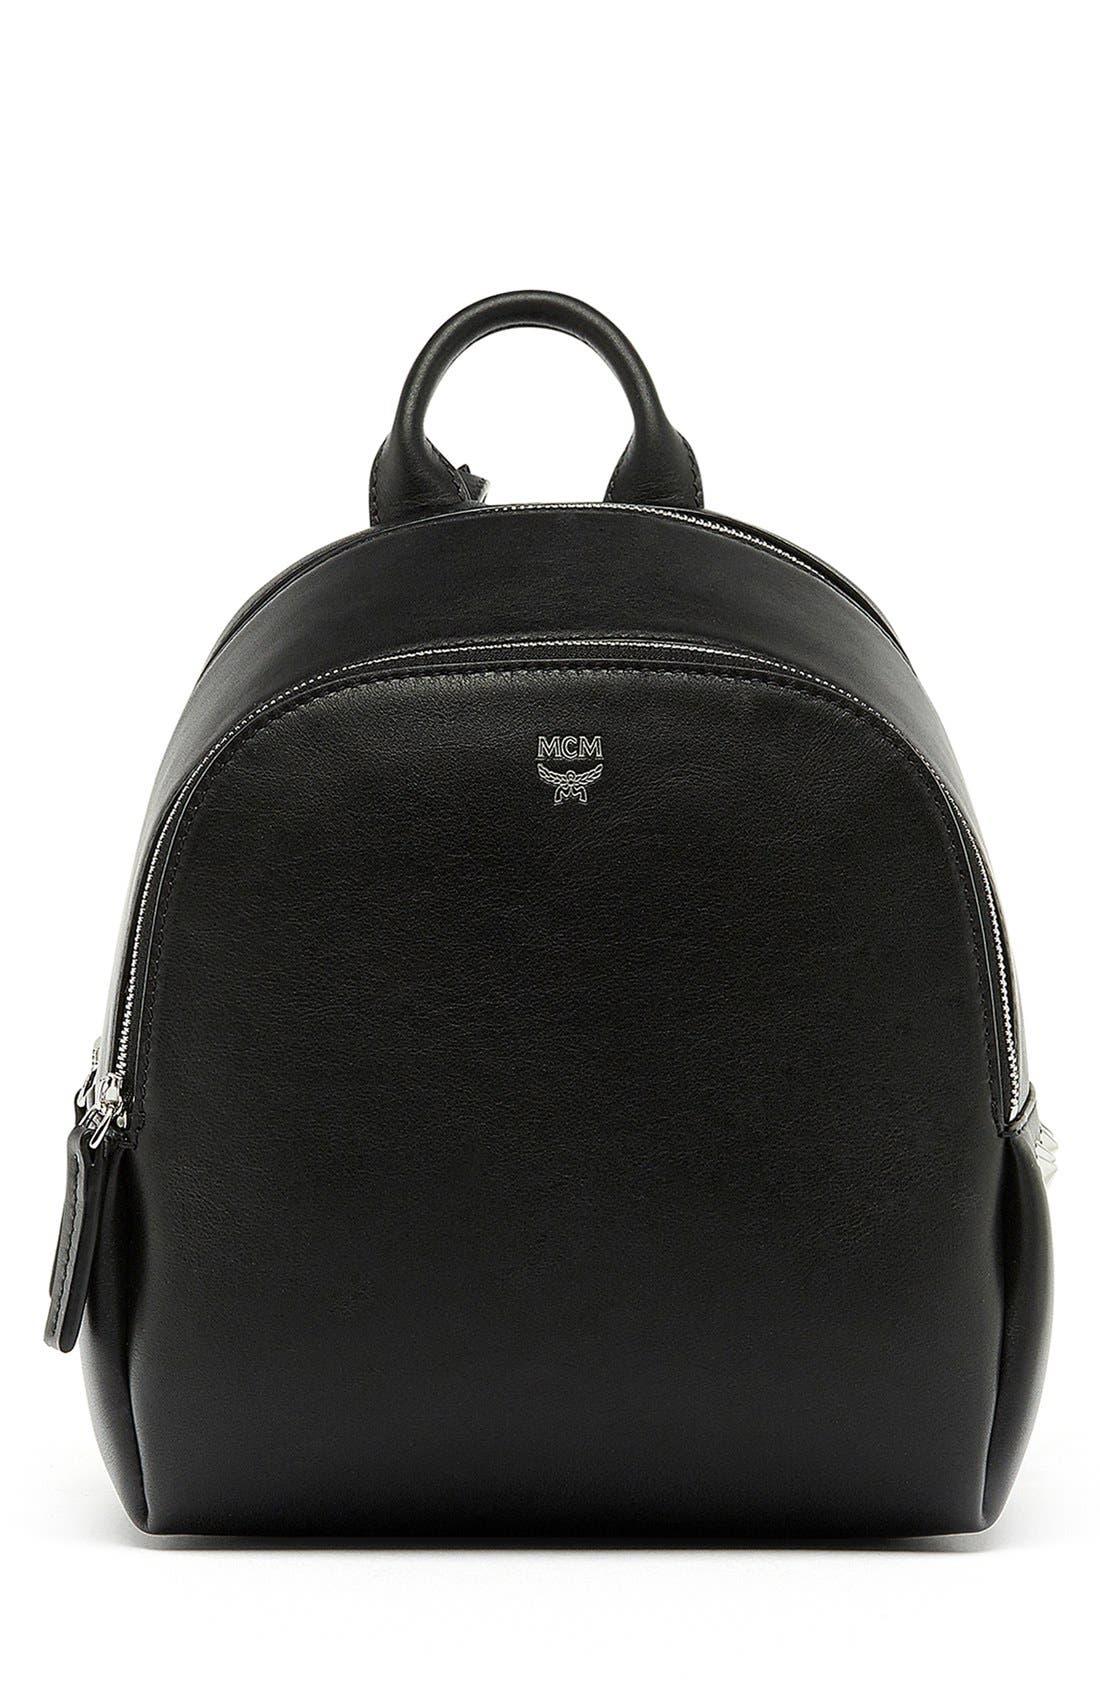 Alternate Image 1 Selected - MCM 'Mini Duchess' Leather Backpack